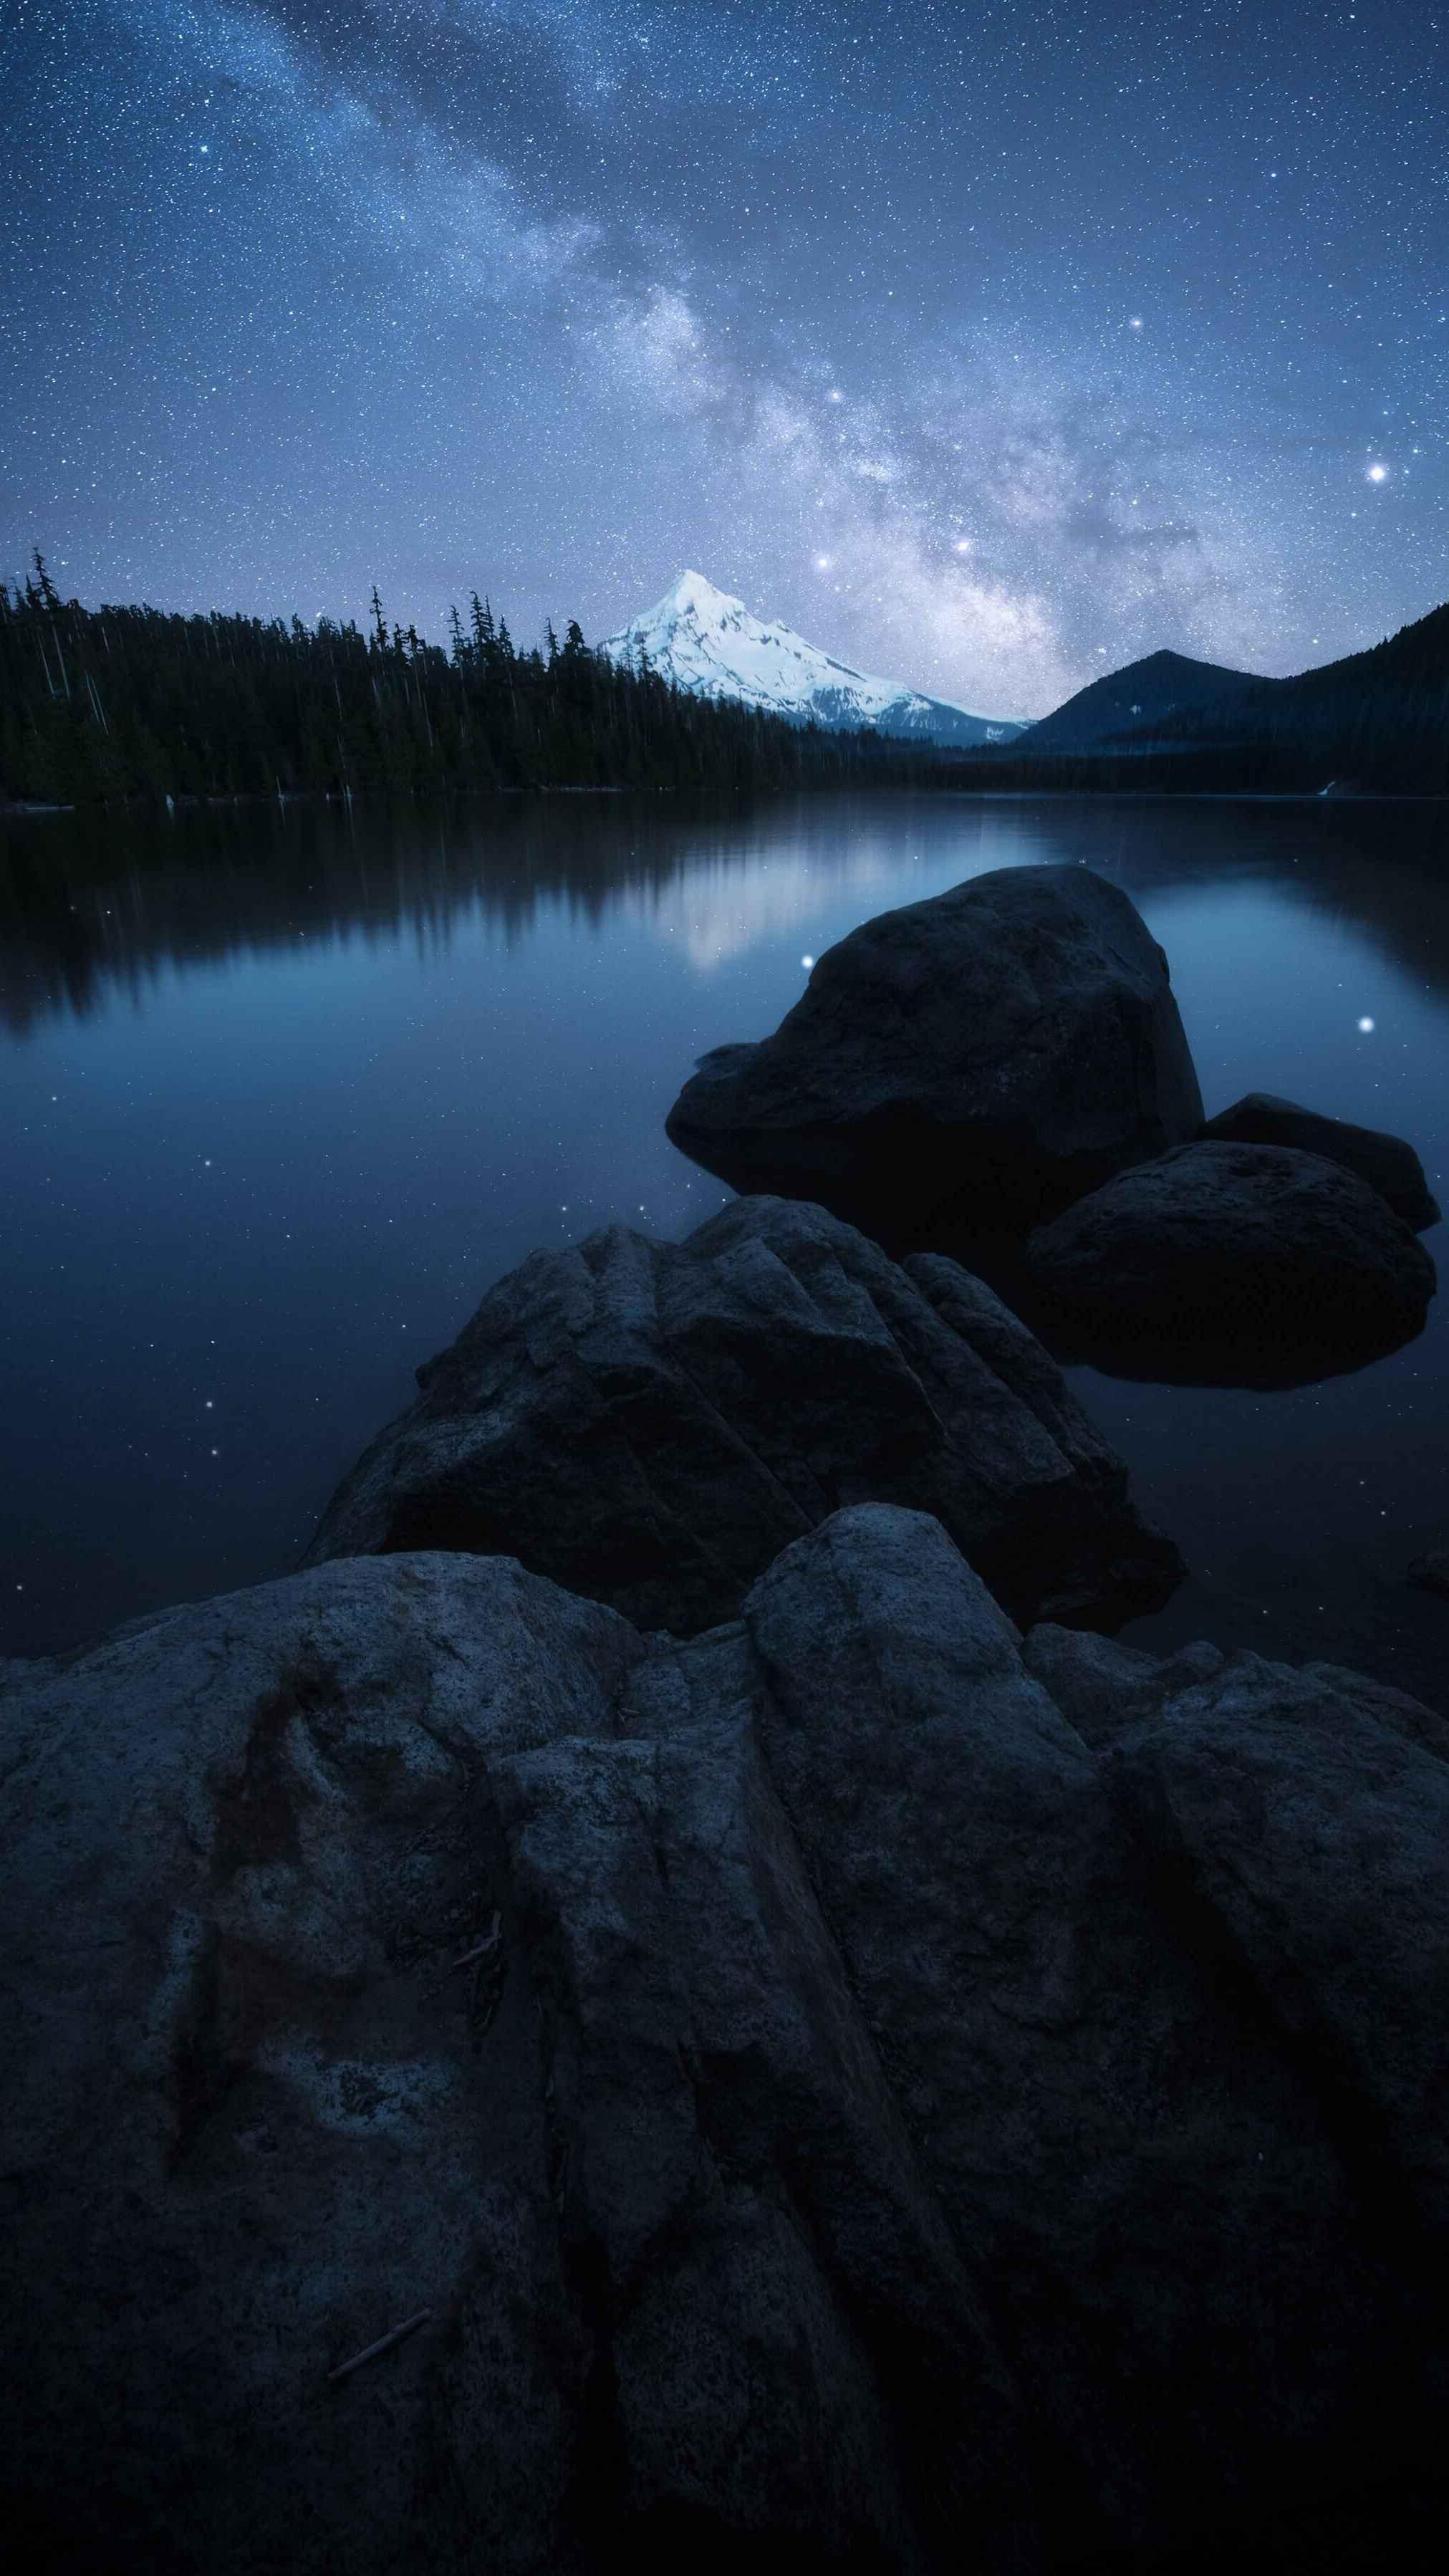 Night Lake Nature iPhone Wallpaper